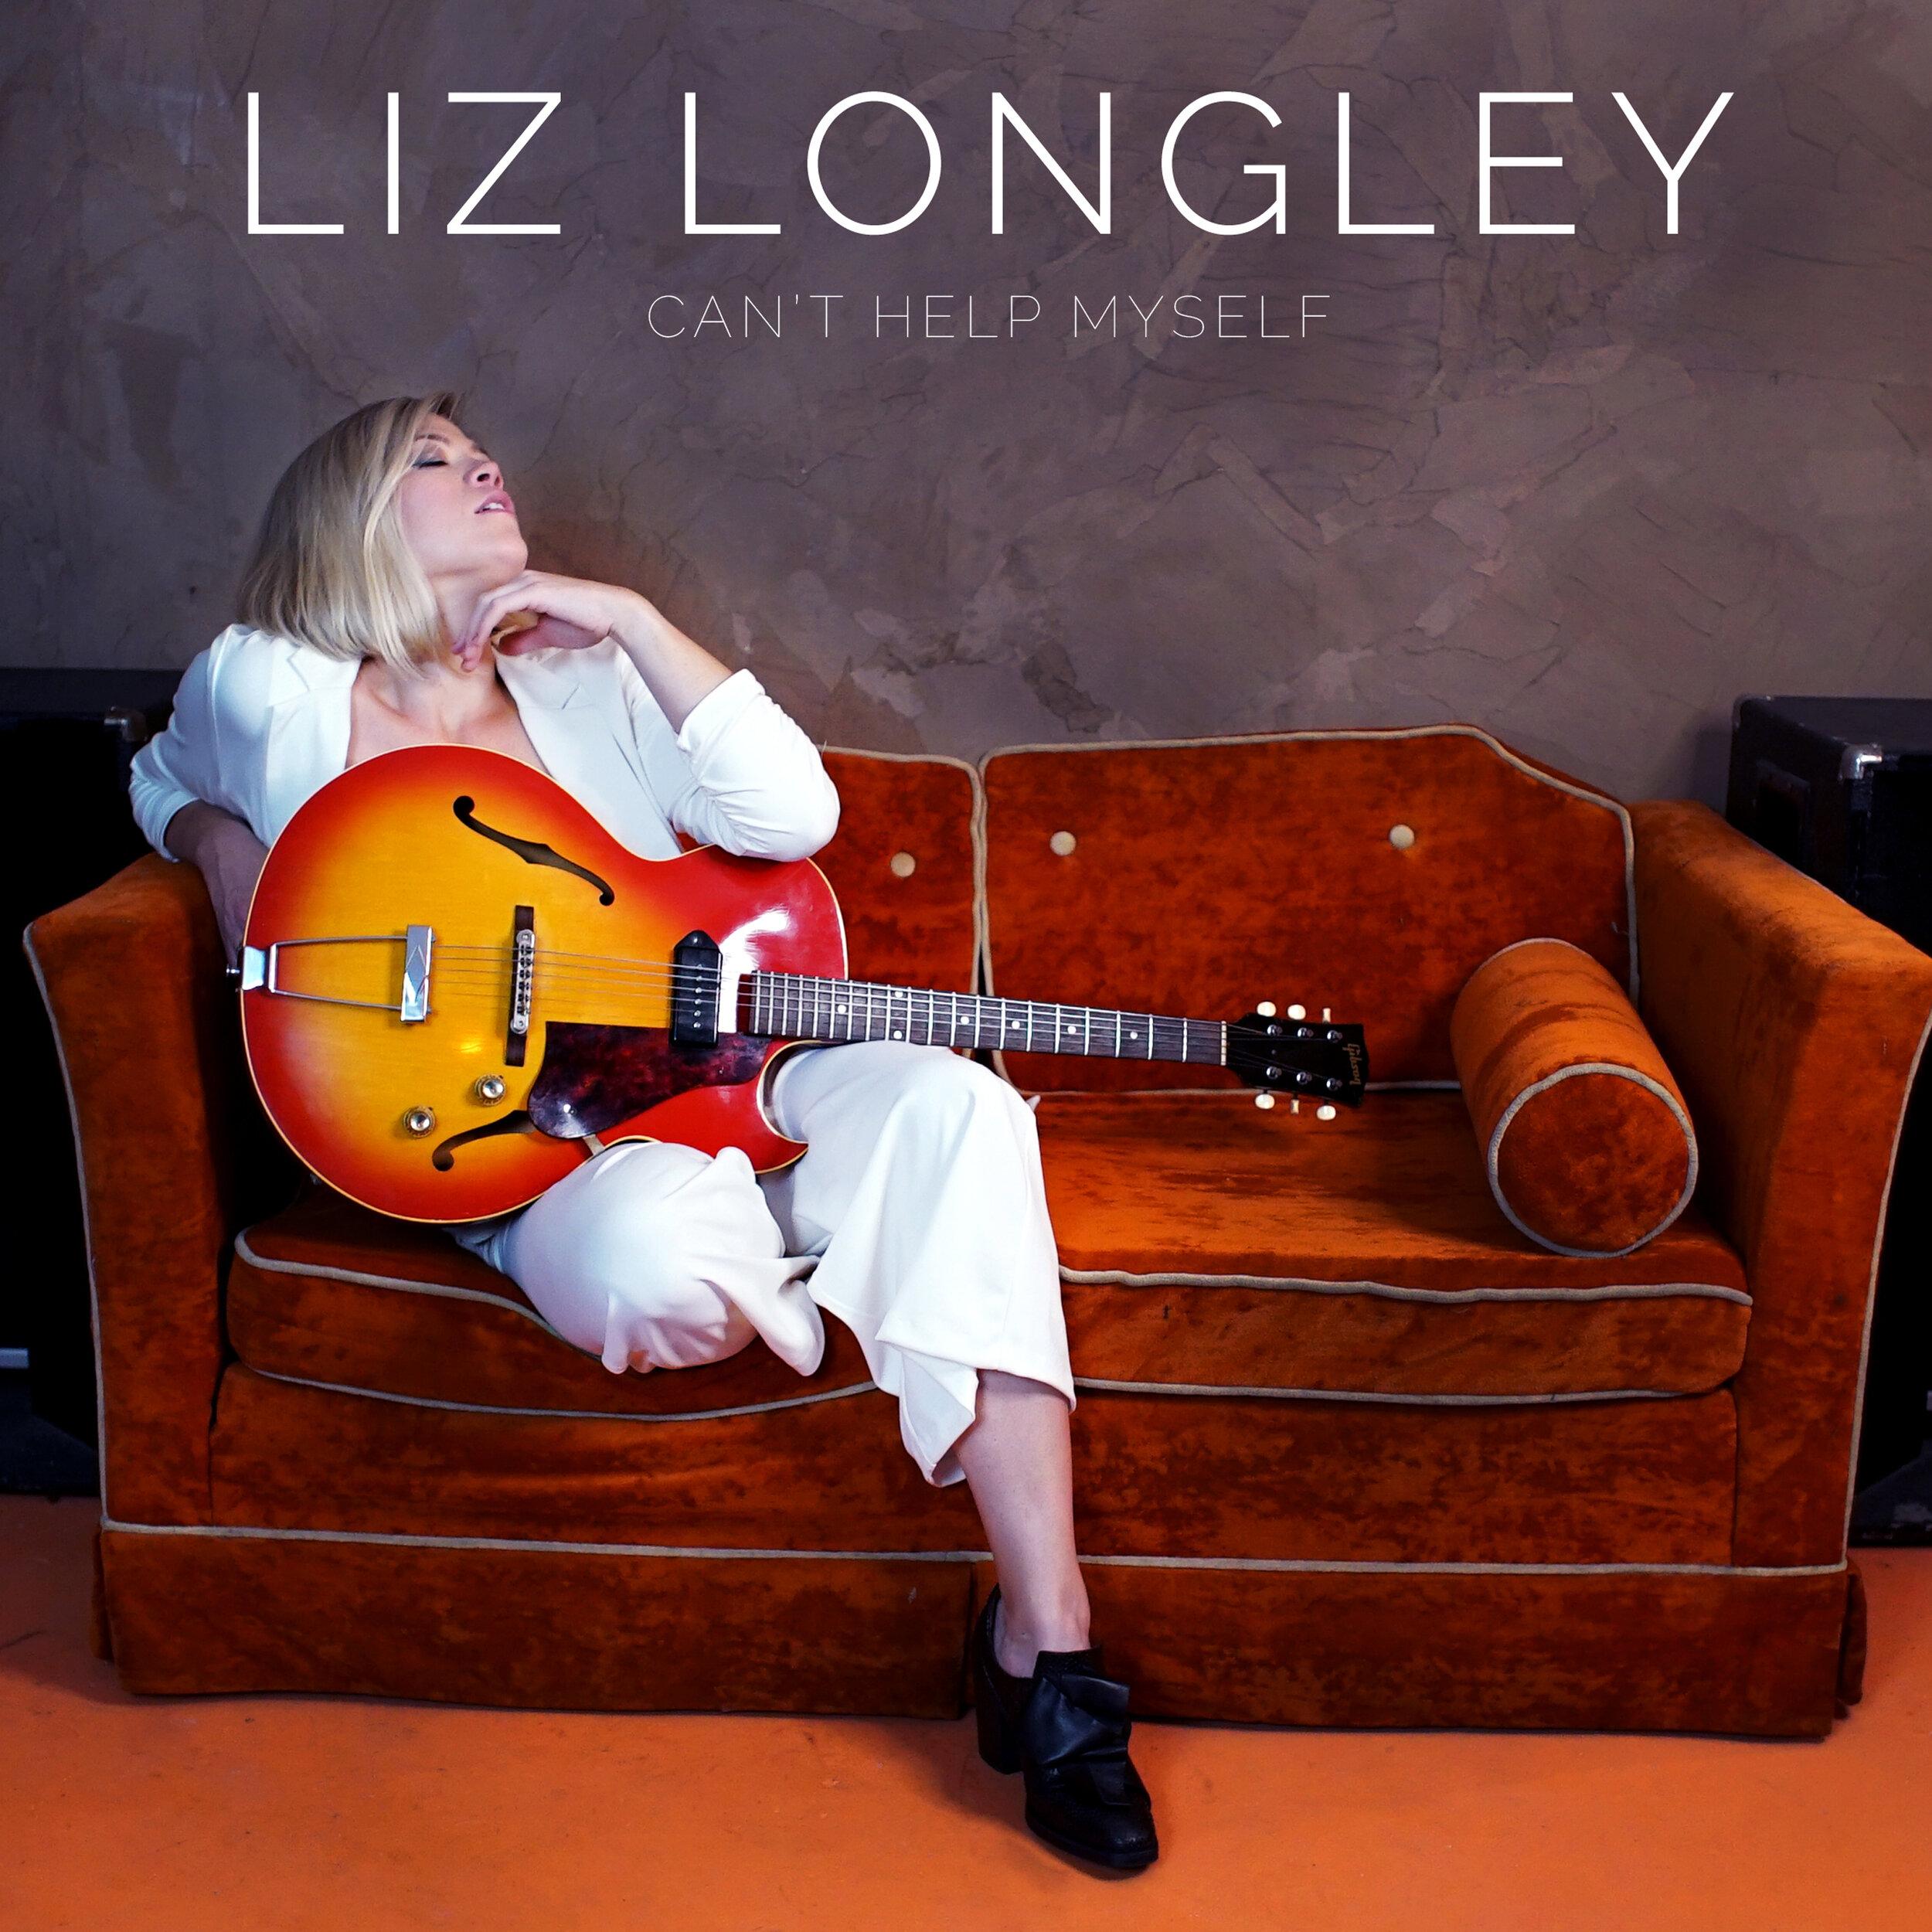 Liz Longley Can't Help Myself CoverArt 3000.jpg